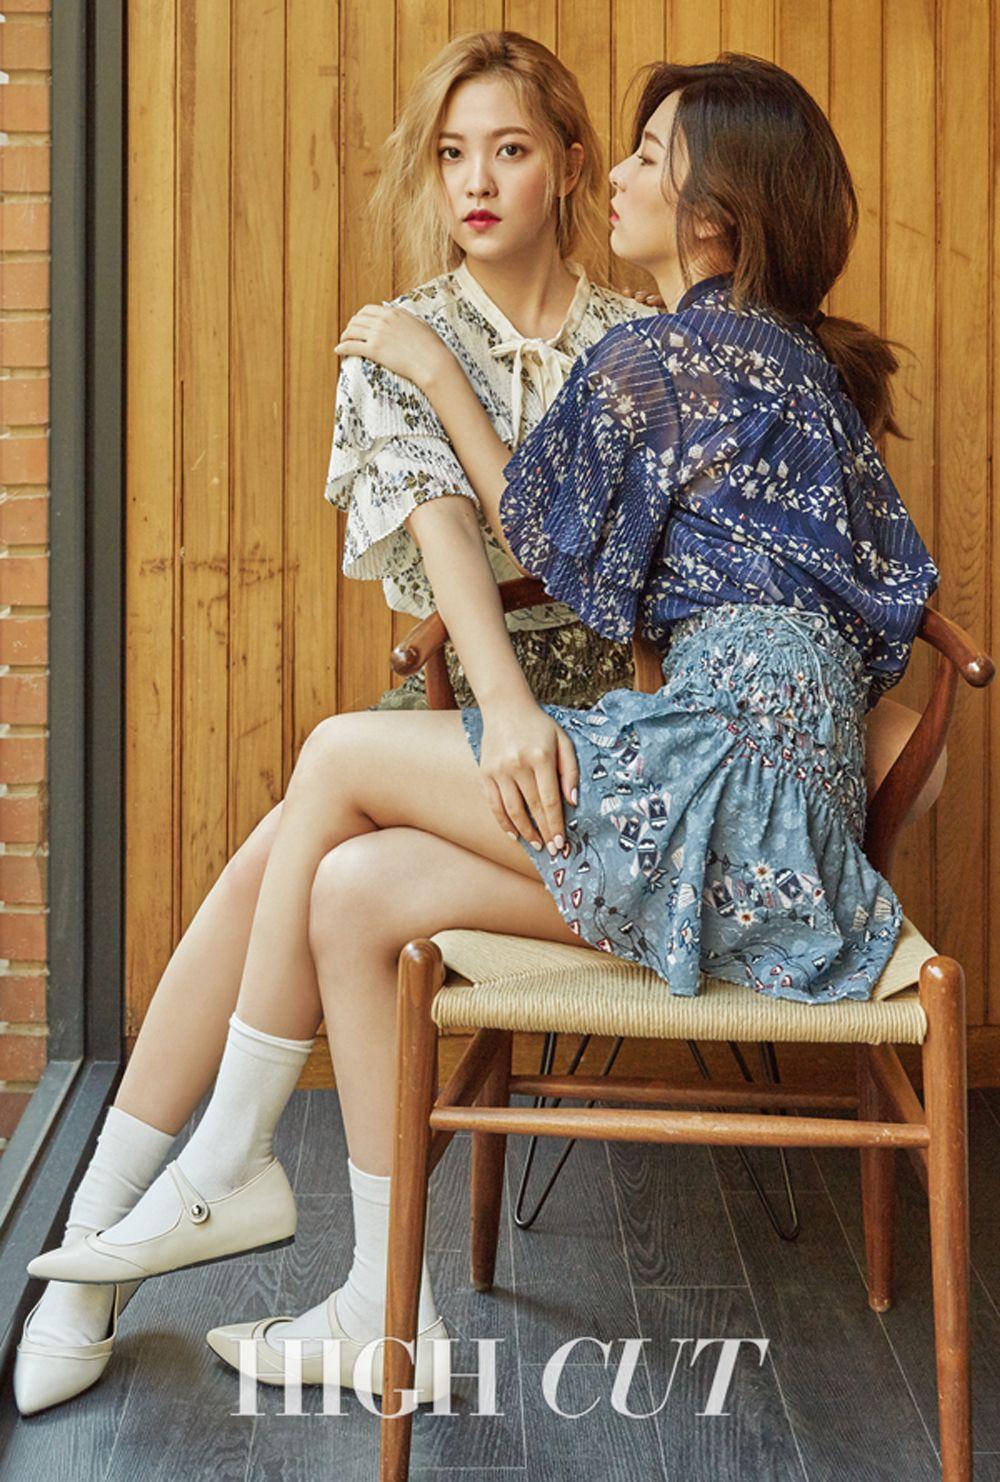 #Red_Velvet #Yeri #Seulgi #레드벨벳 #예리 #슬기